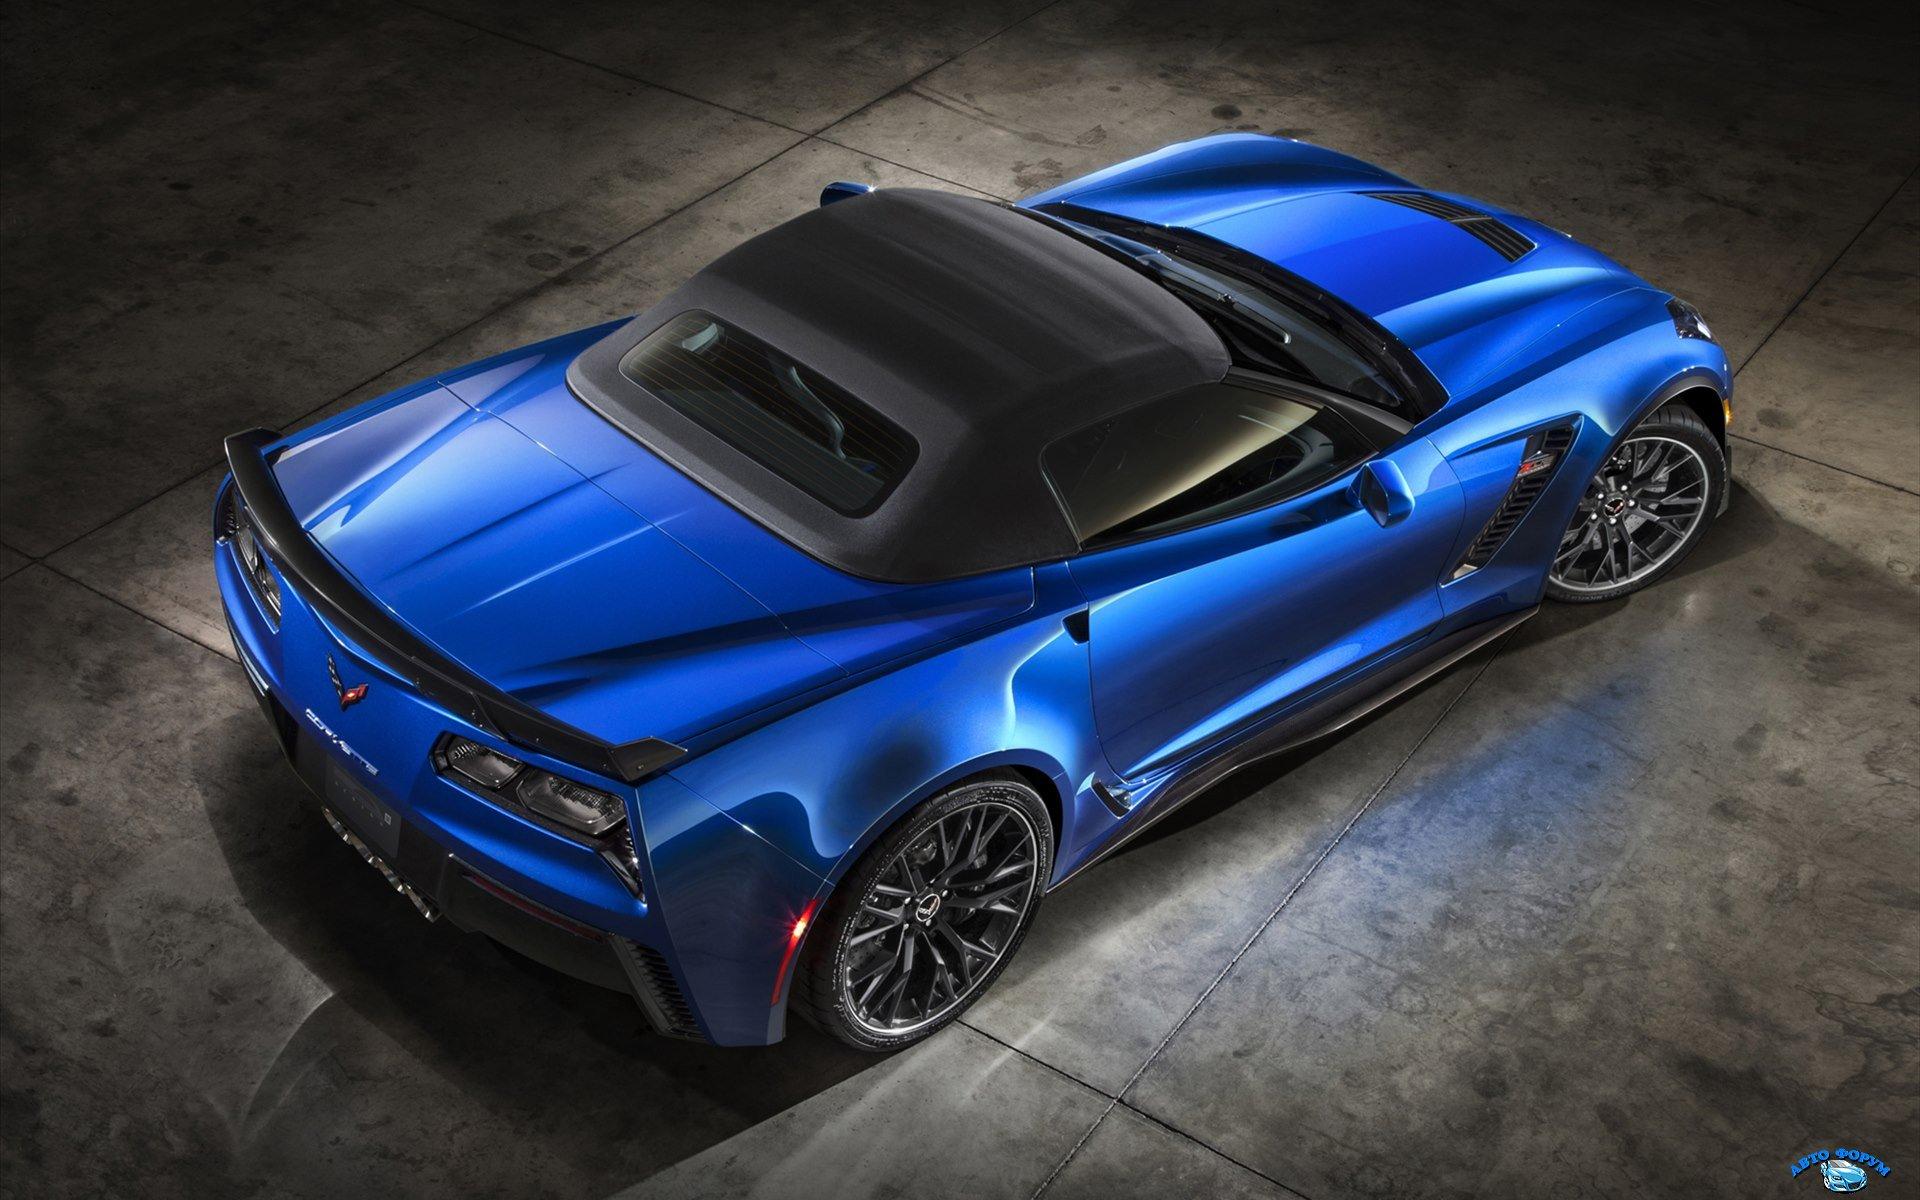 Chevrolet-Corvette-Z06-Convertible-2015-widescreen-08.jpg